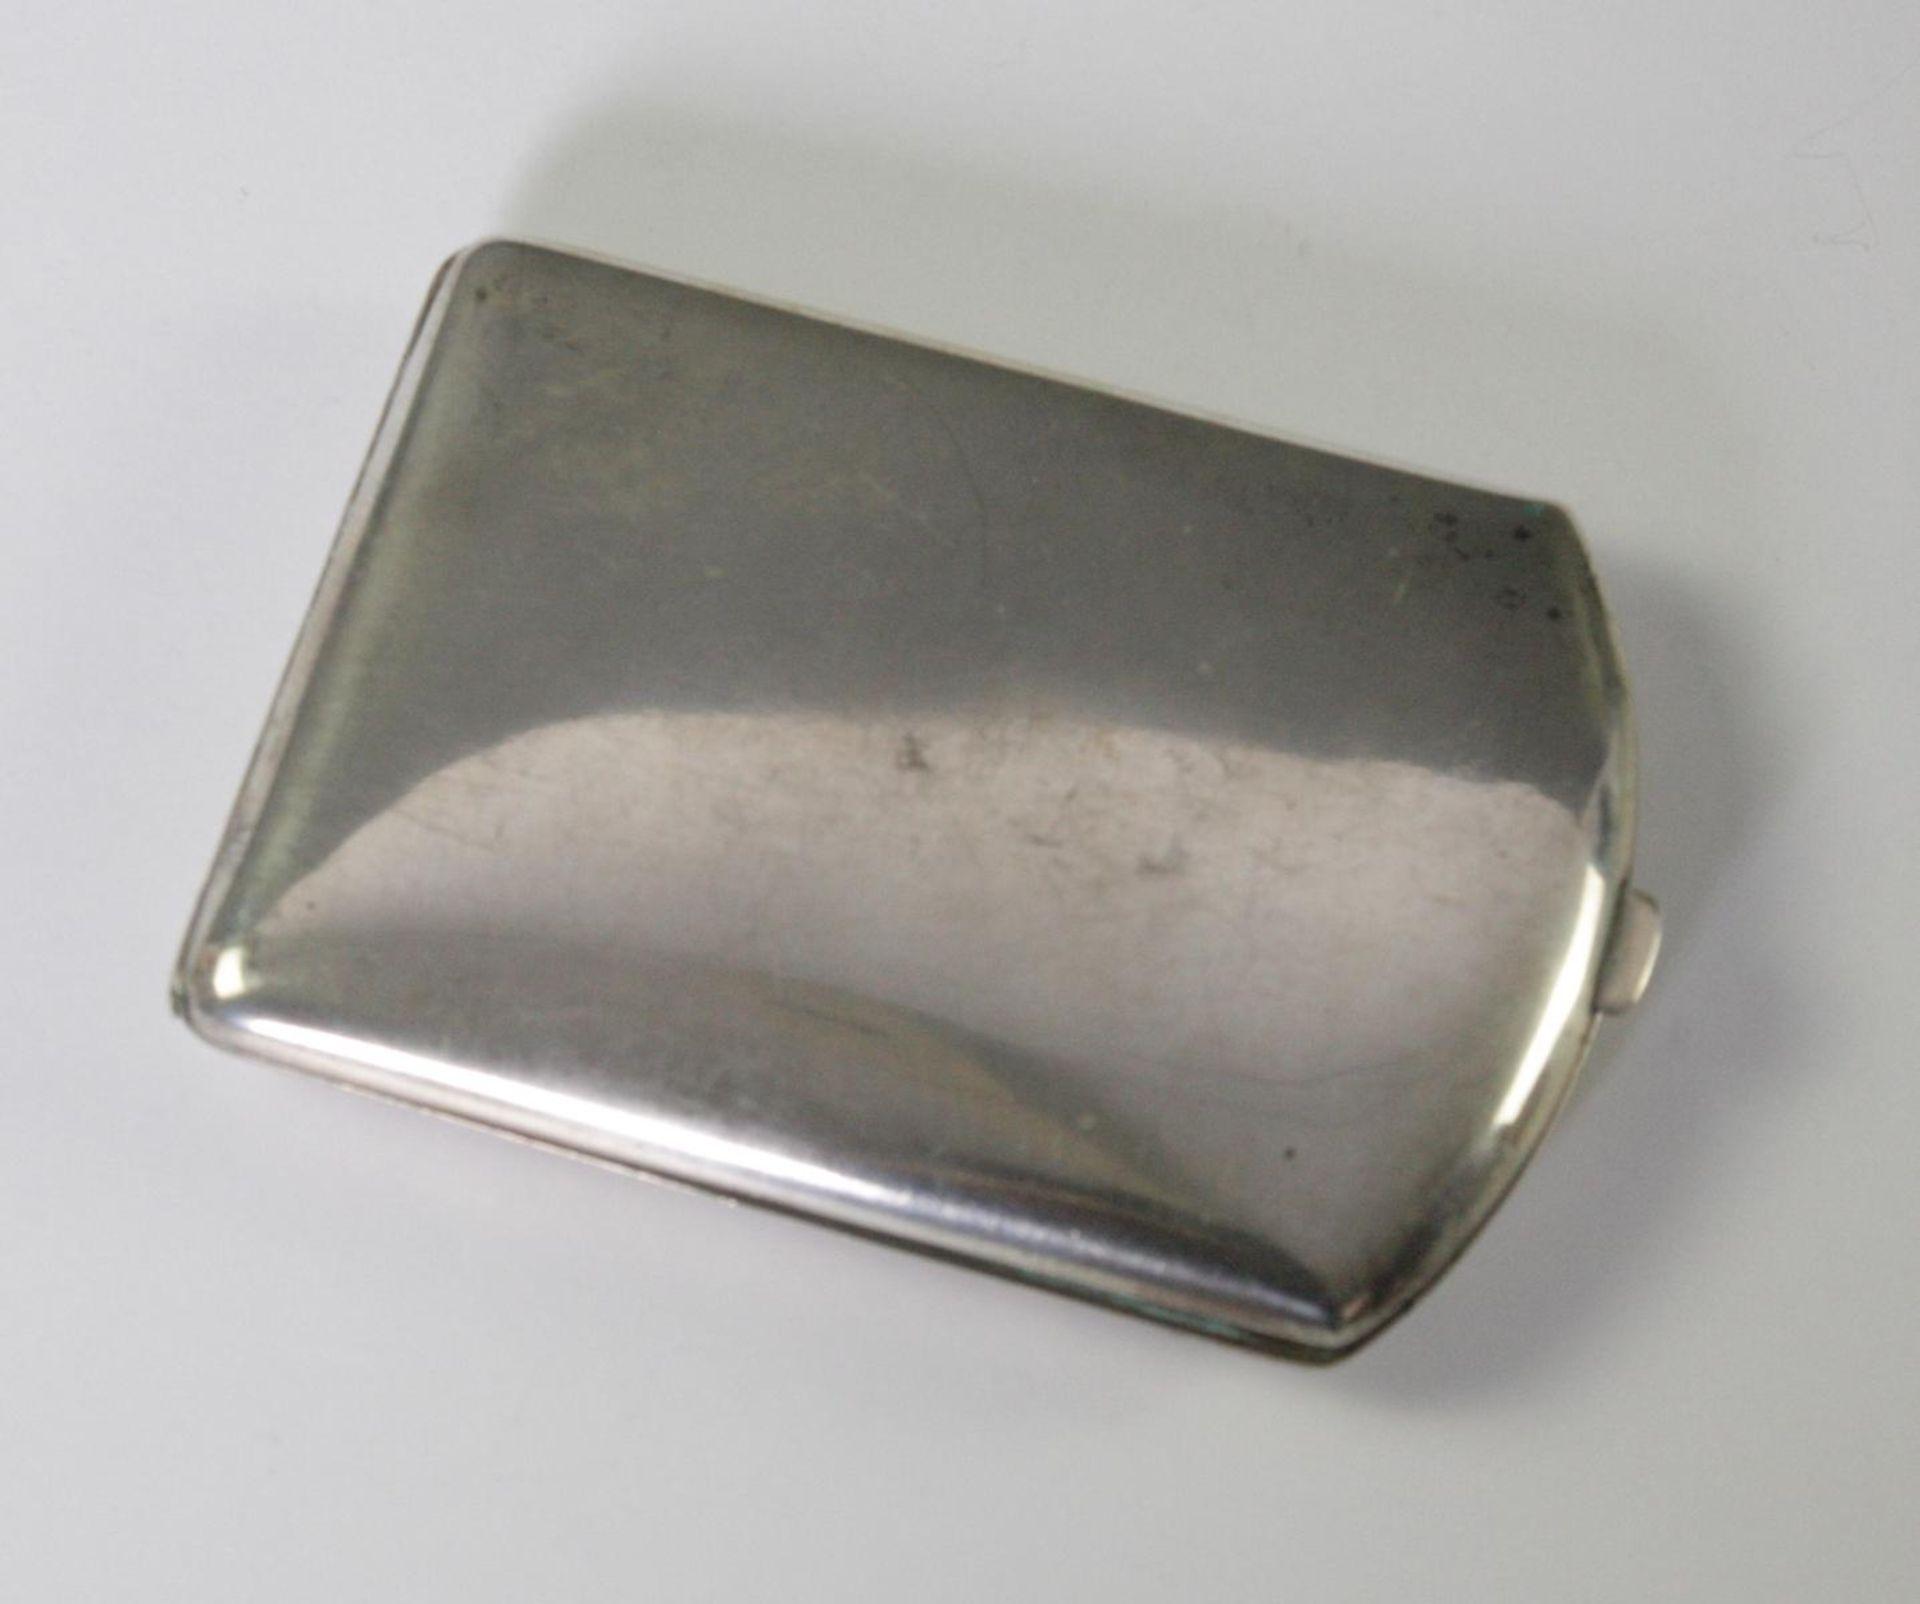 Zigarettenetui 800er Silber - Bild 2 aus 4